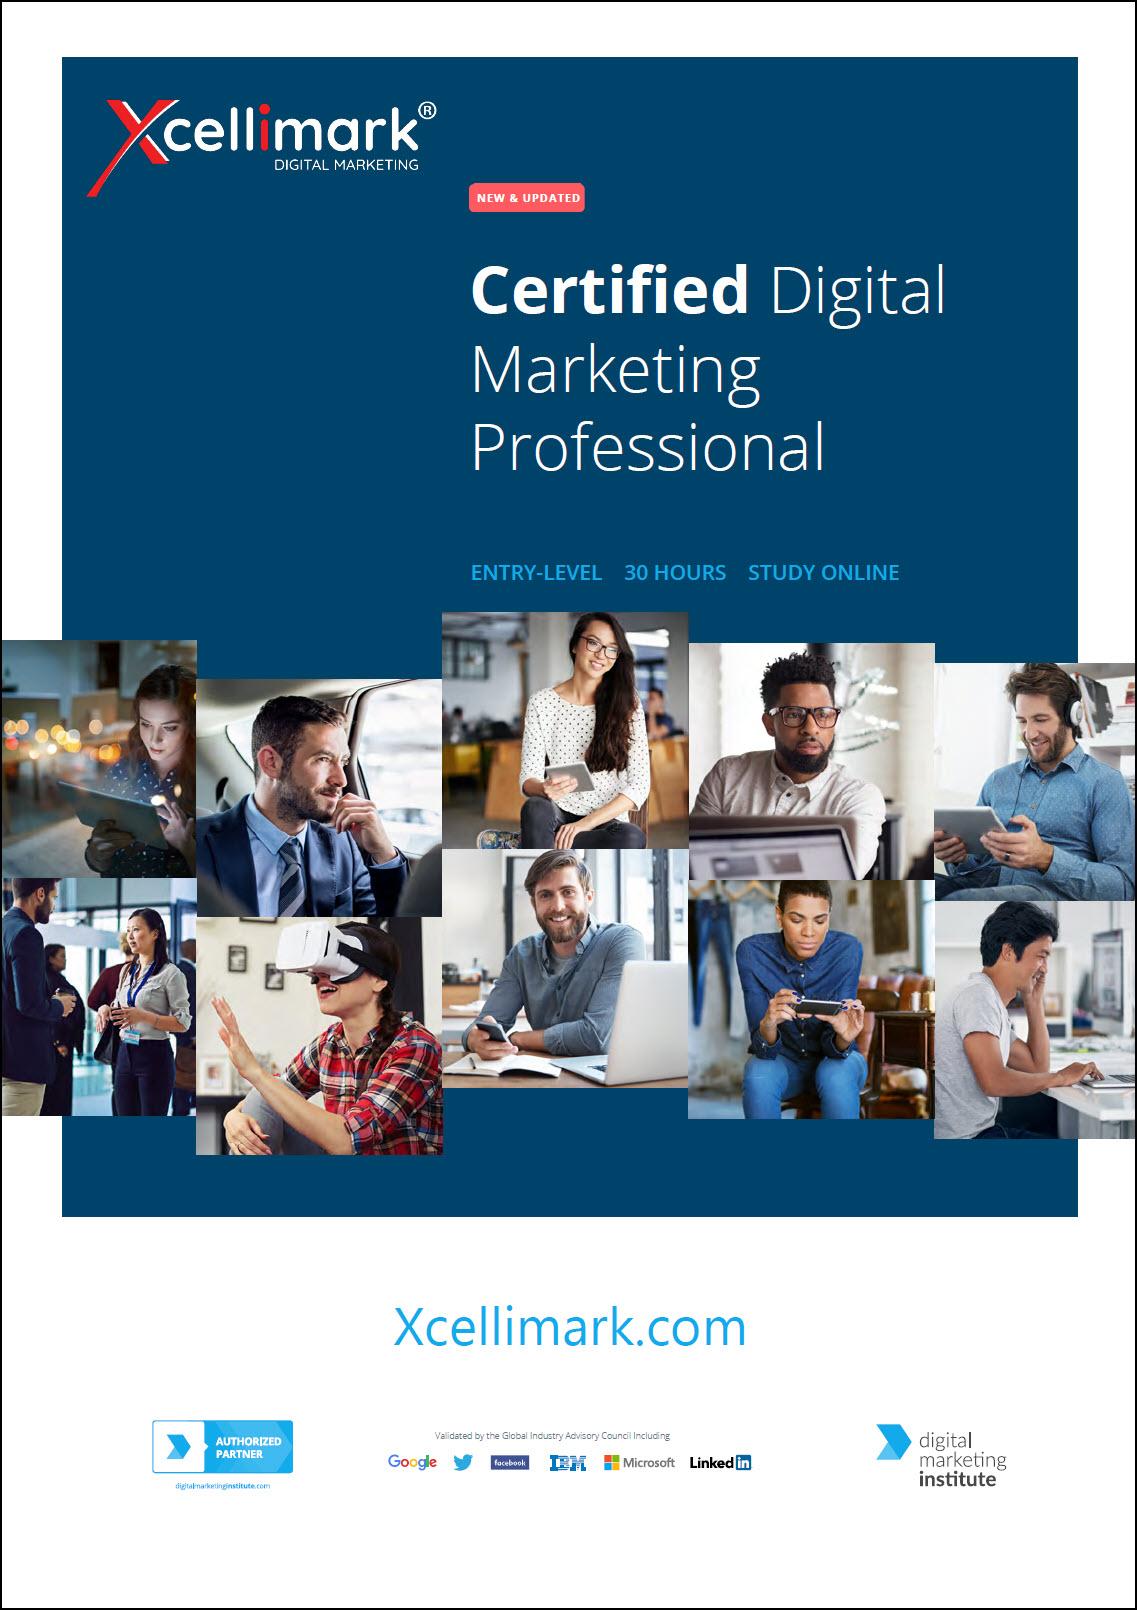 Certified Digital Marketing Professional Brochure